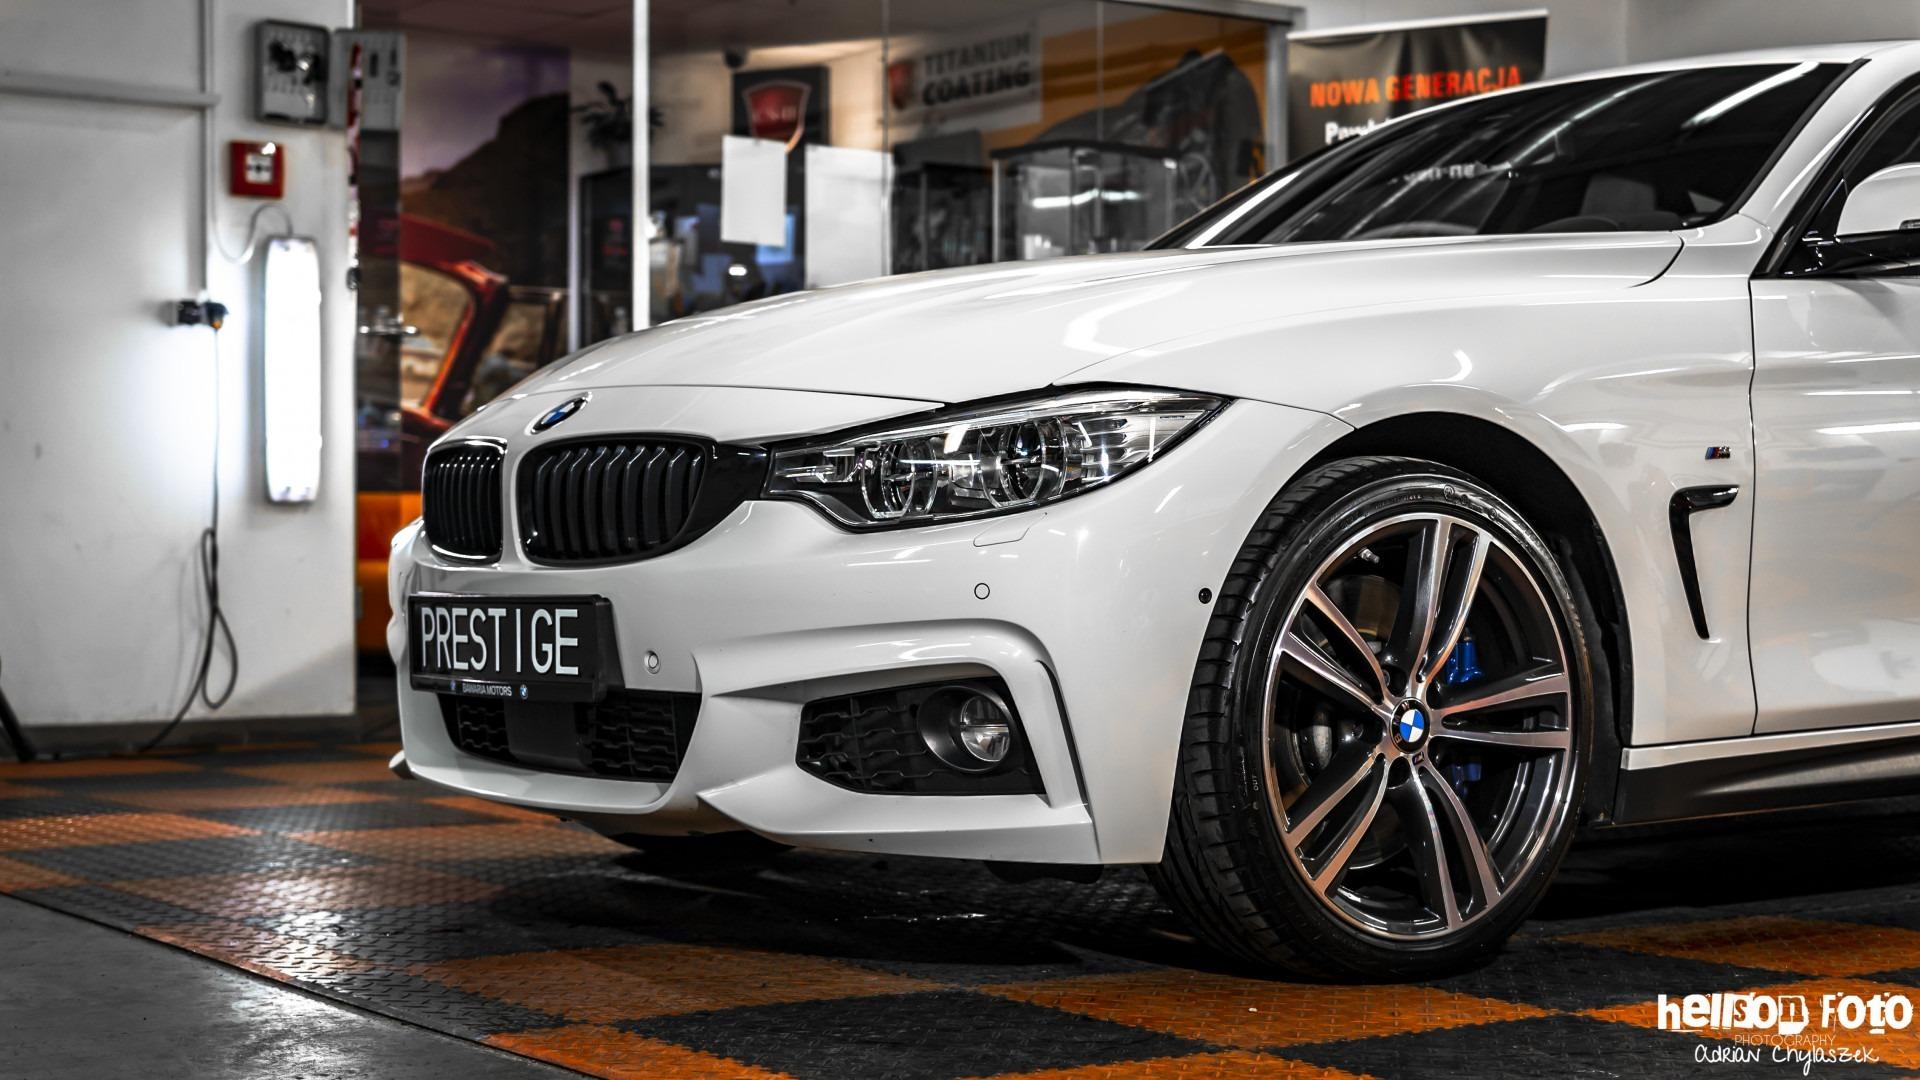 Białe BMW serii 4 lewe nadkole